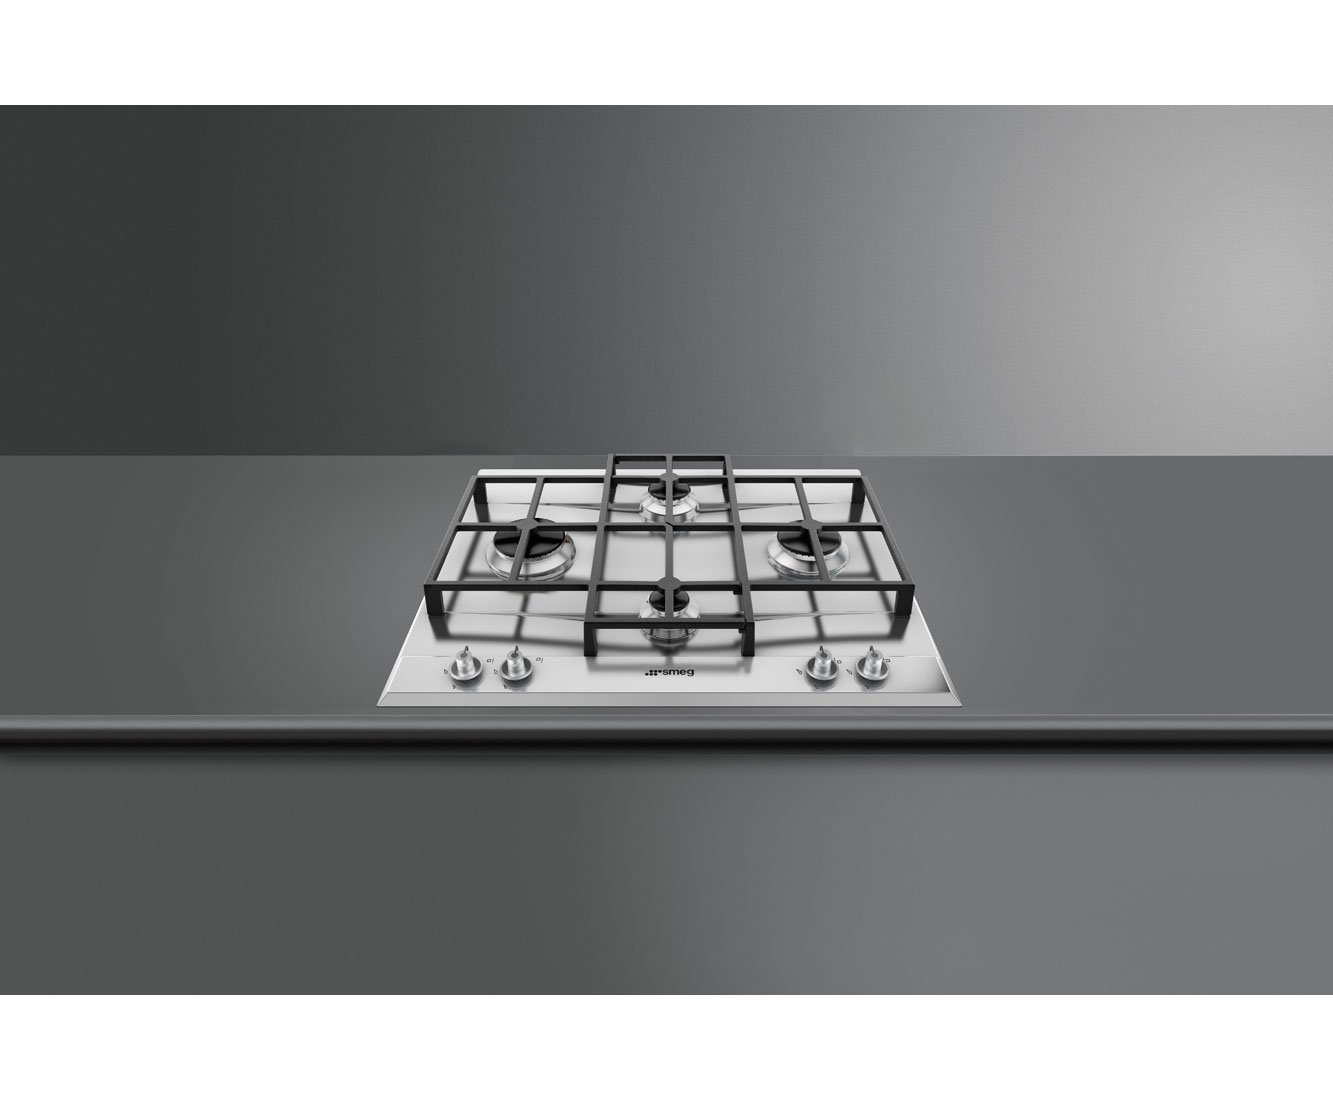 Smeg Linea P1640X Gas Hob Stainless Steel, 60 cm